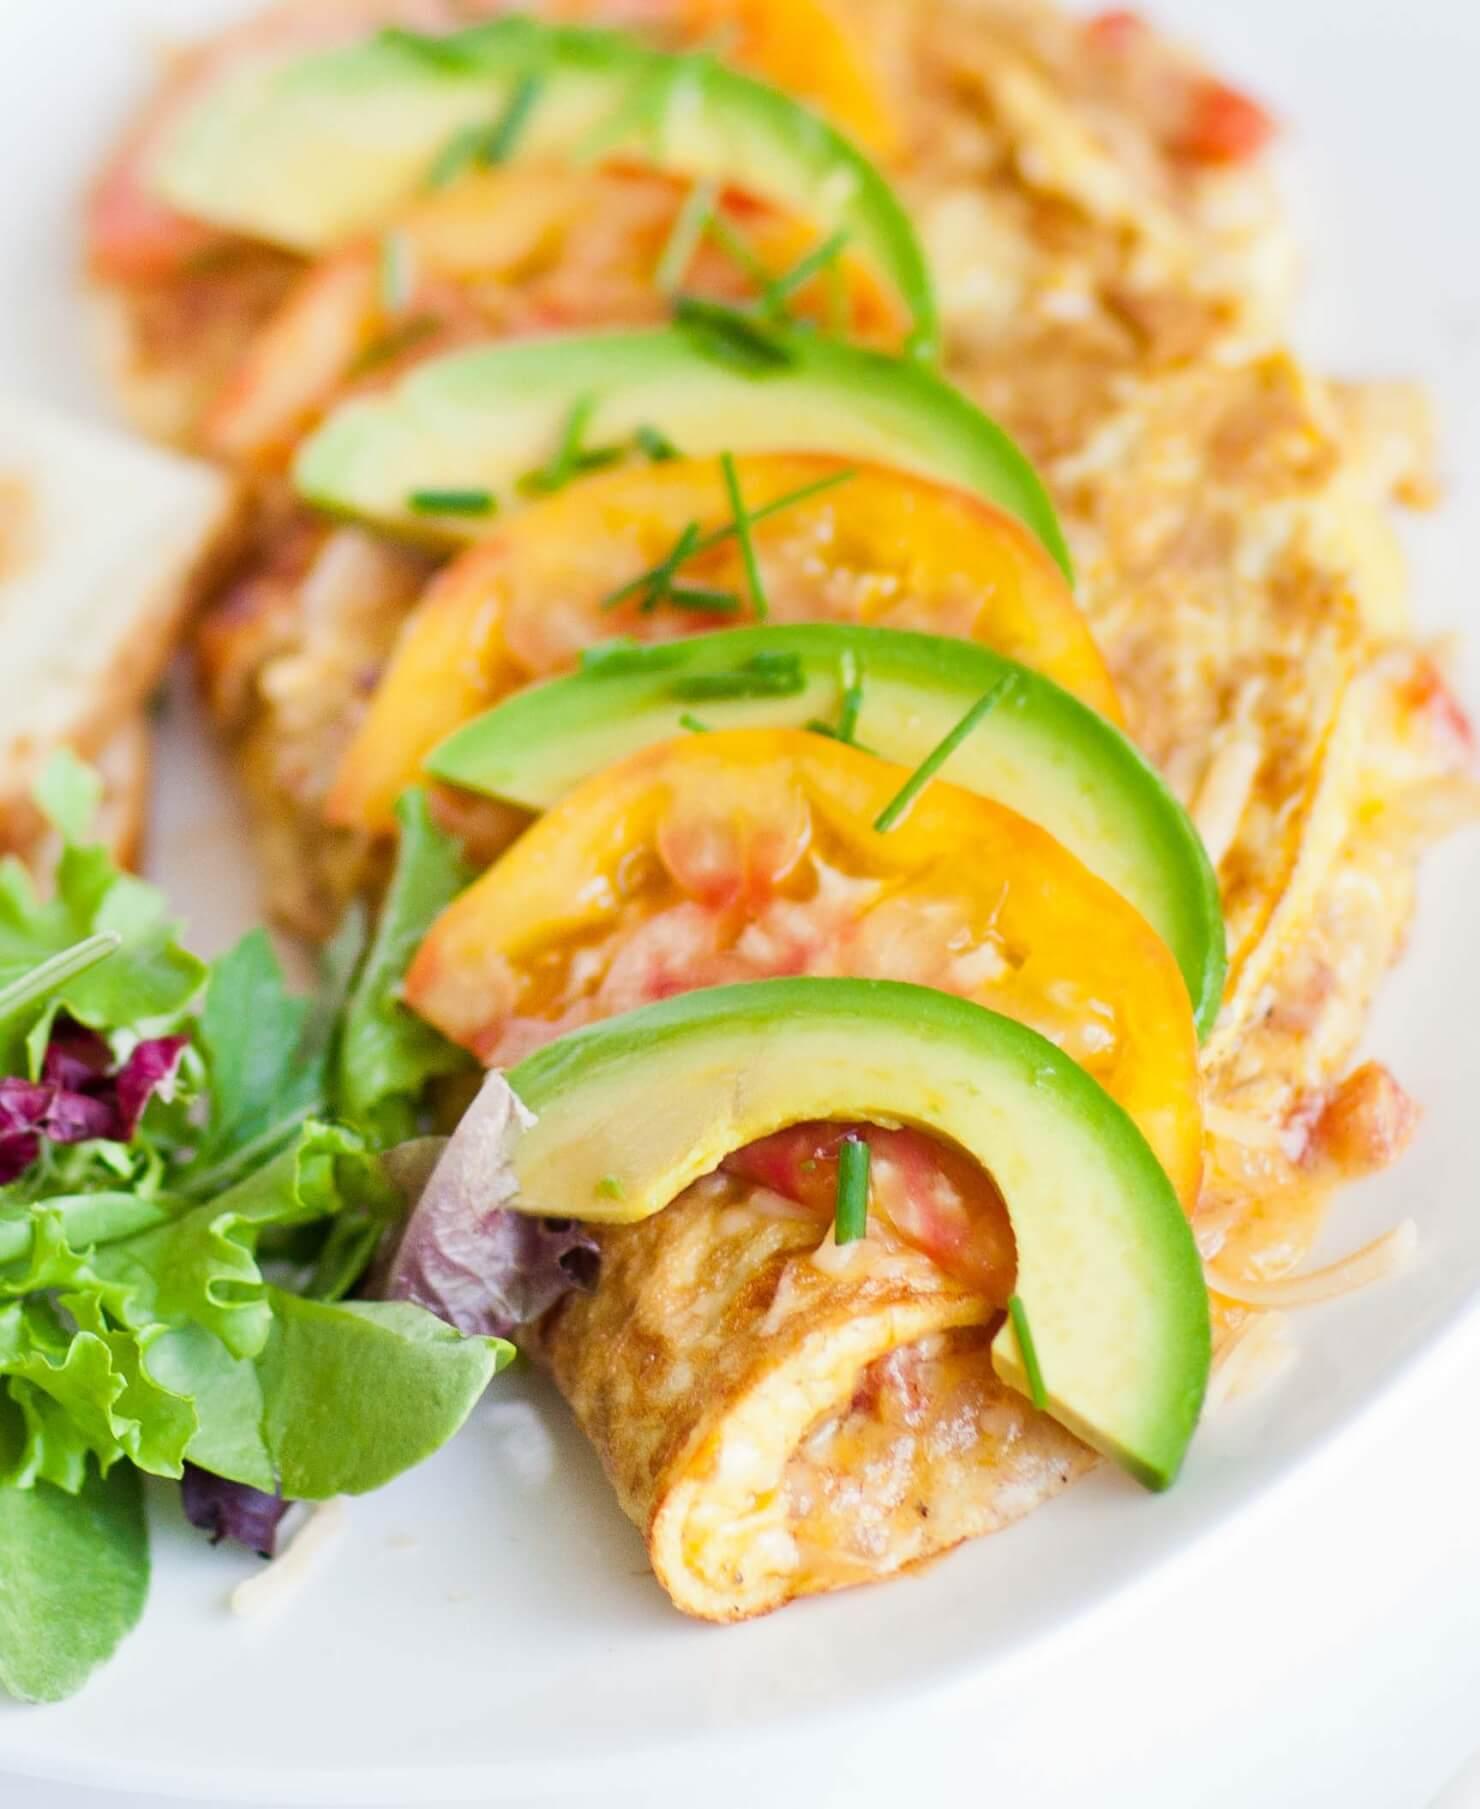 Weekend Breakfast Omelette With Gruyere And Avocado